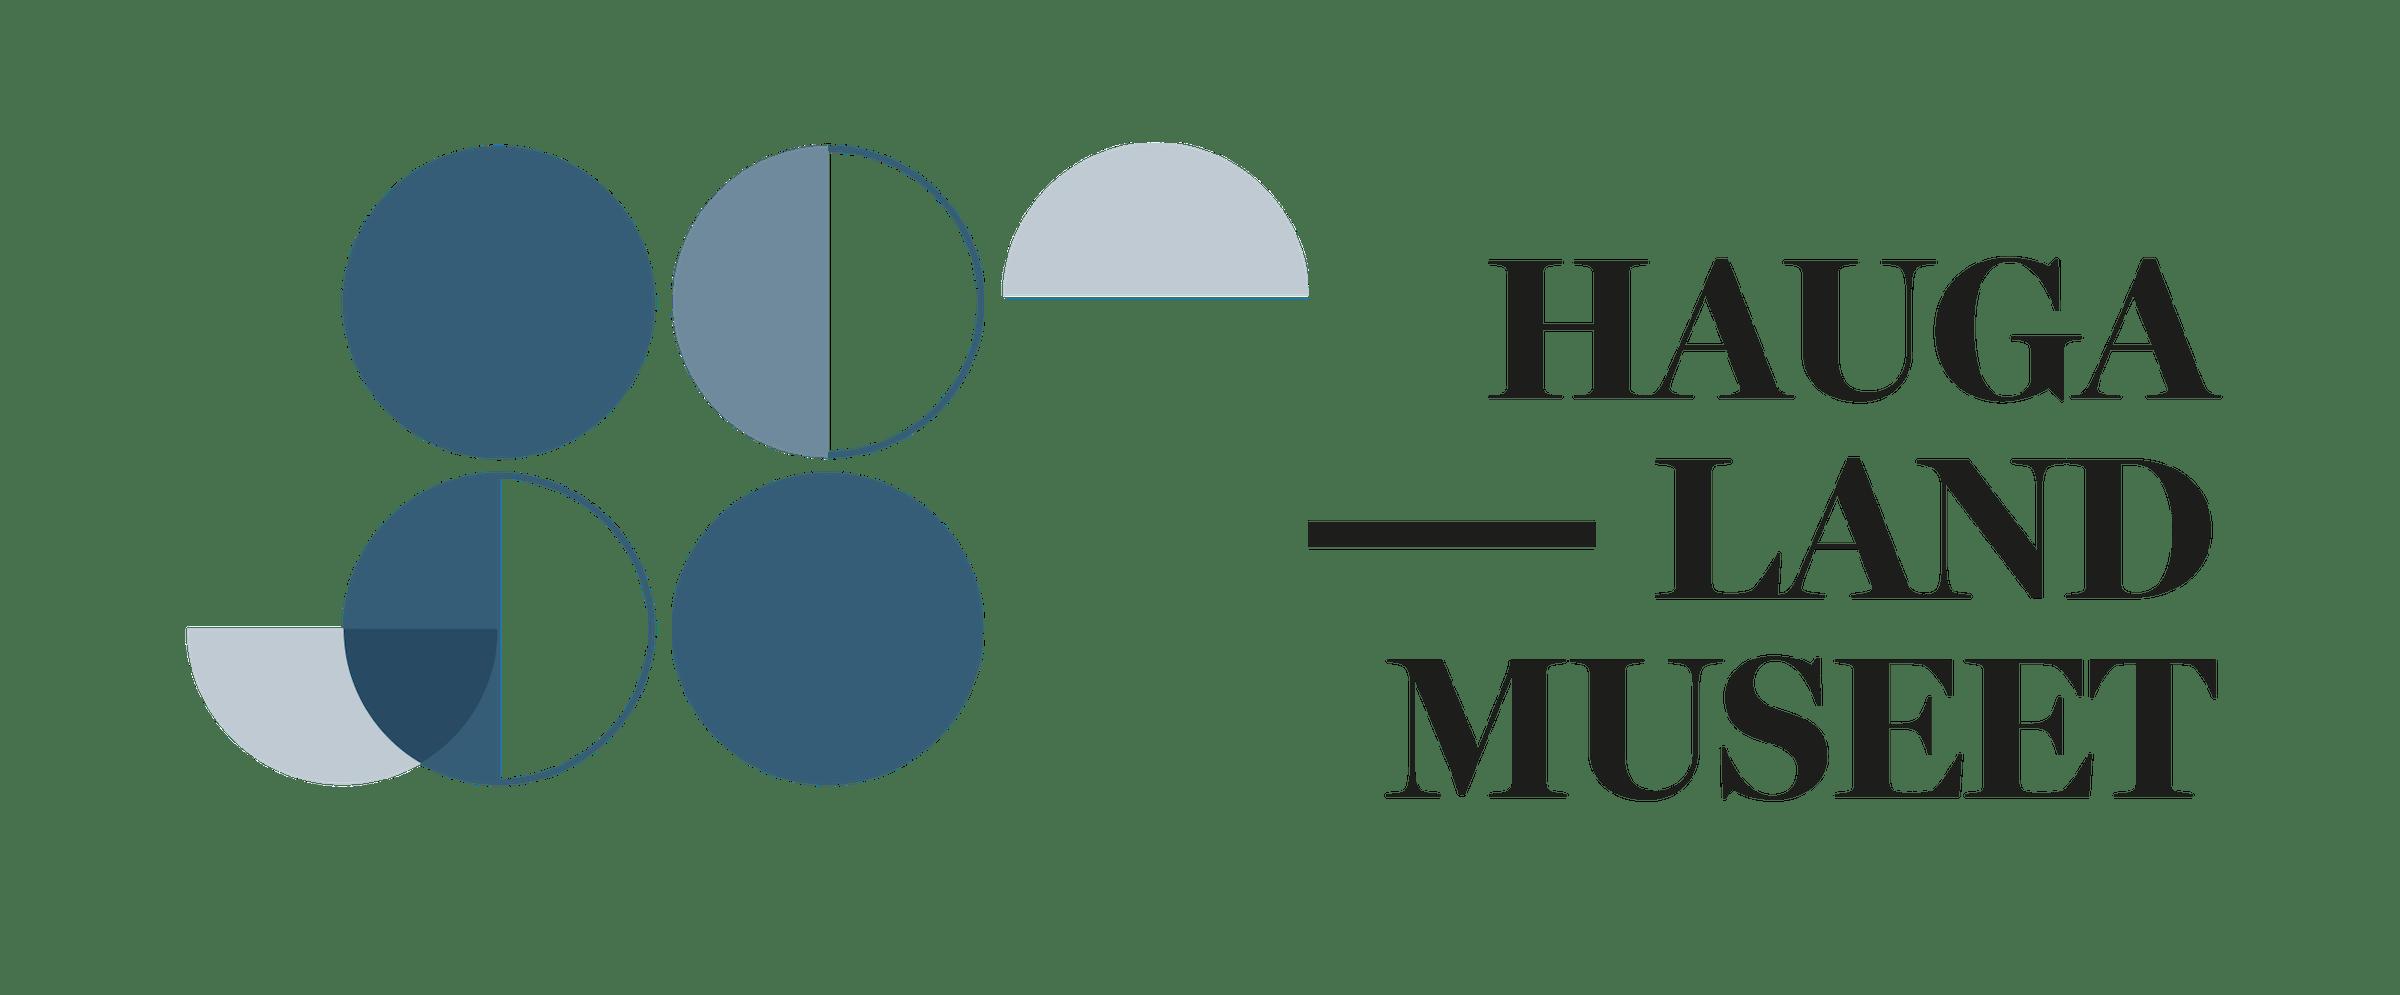 Haugalandmuseet_logo_liggende_blå